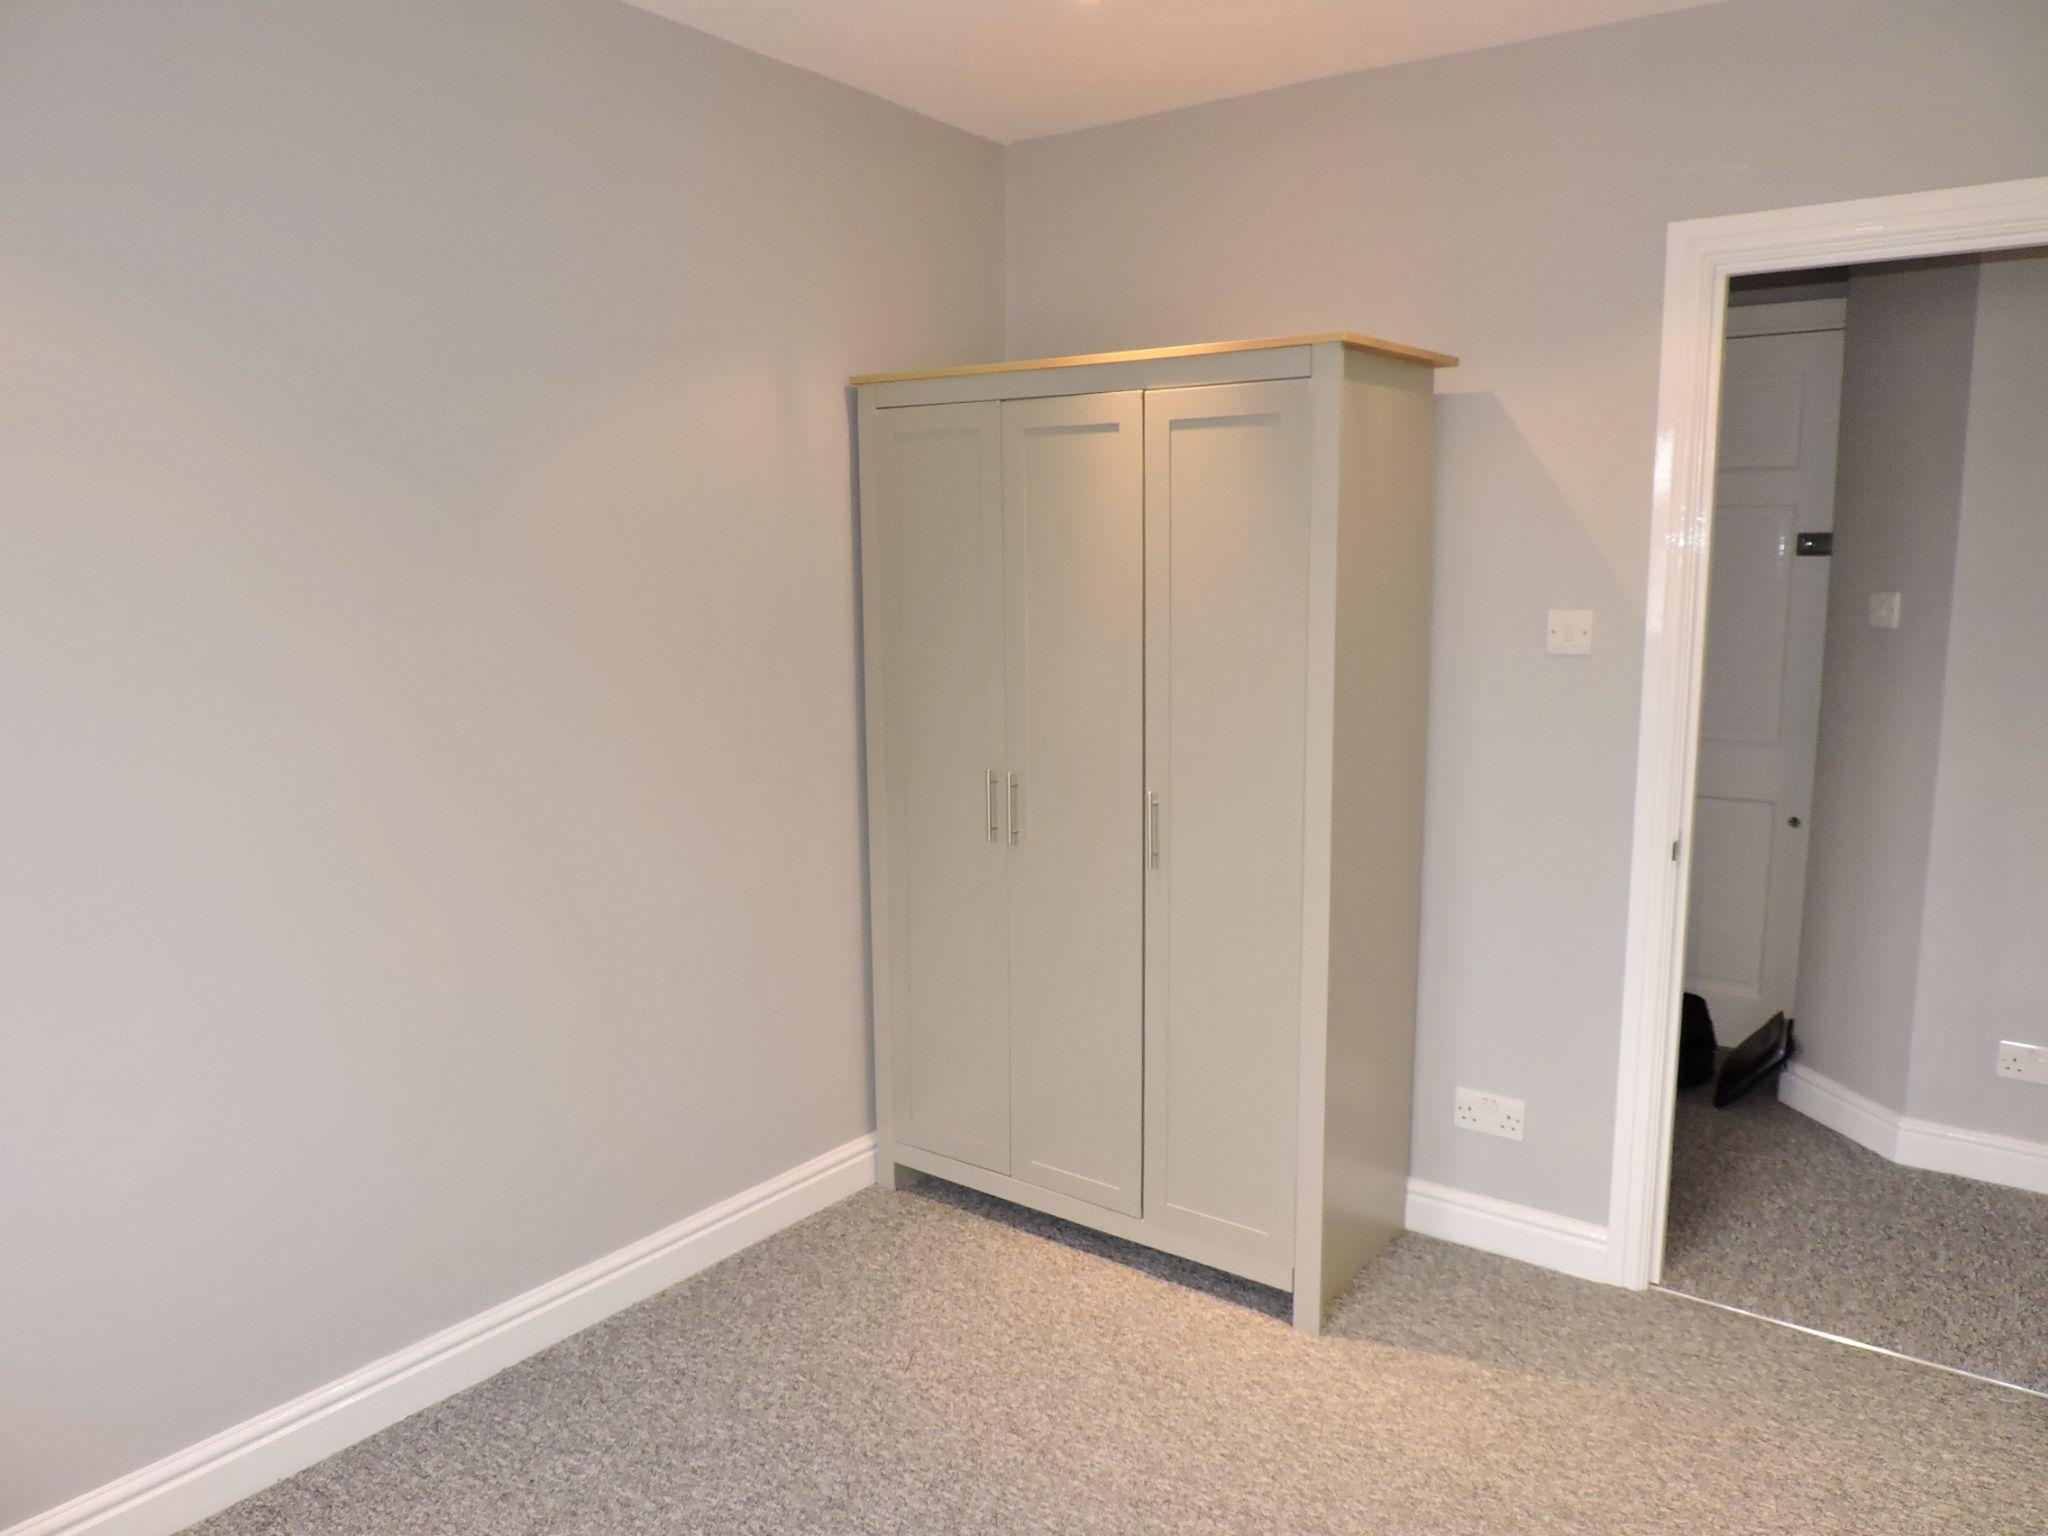 1 bedroom maisonette flat/apartment Let in Cobham - Photograph 6